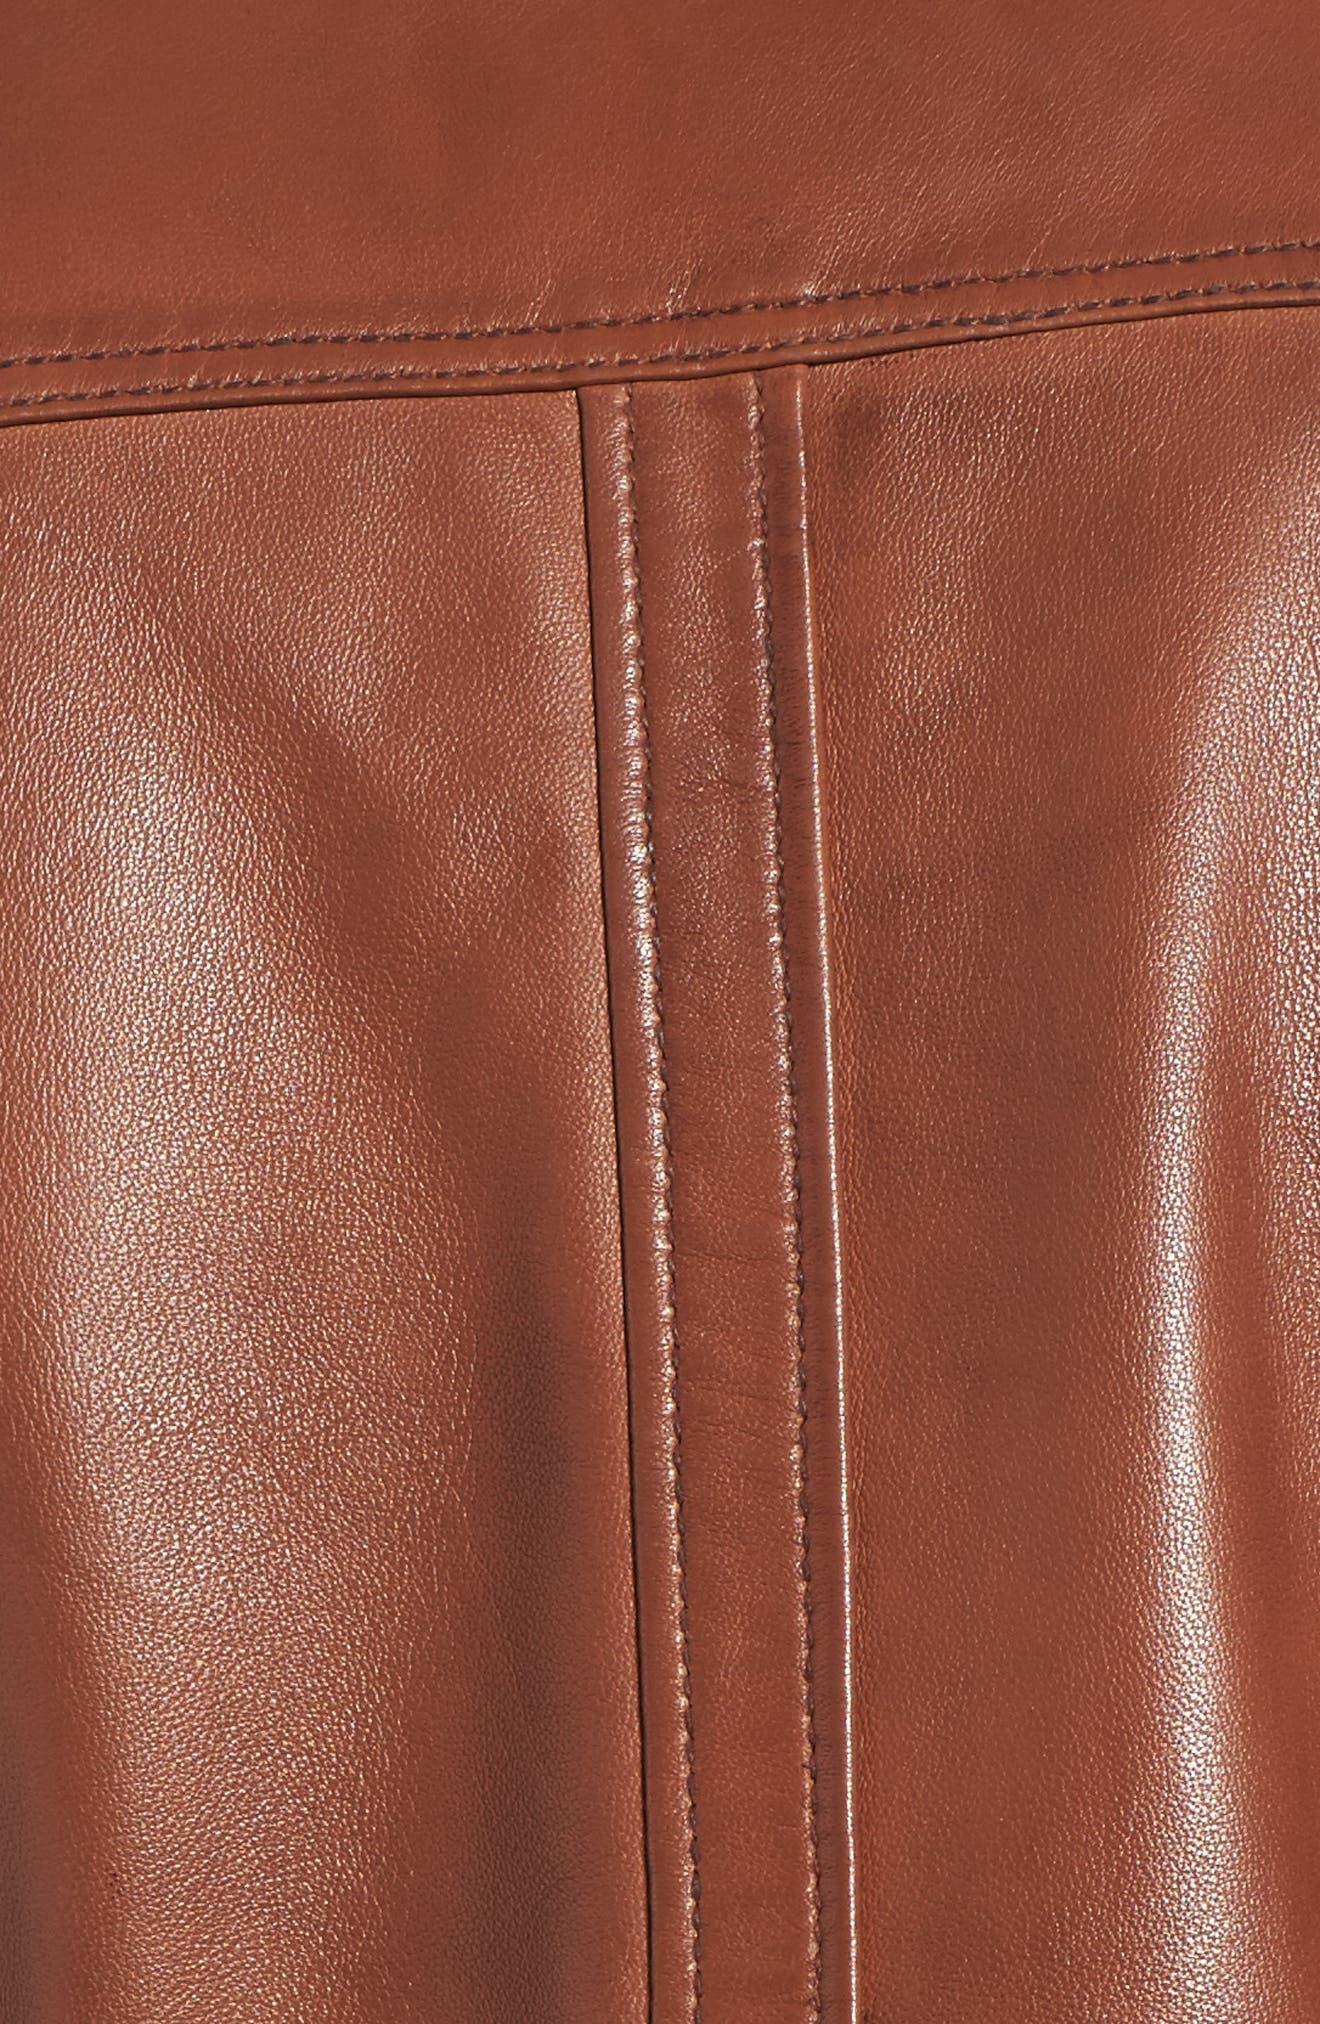 Leather Moto Jacket,                             Alternate thumbnail 12, color,